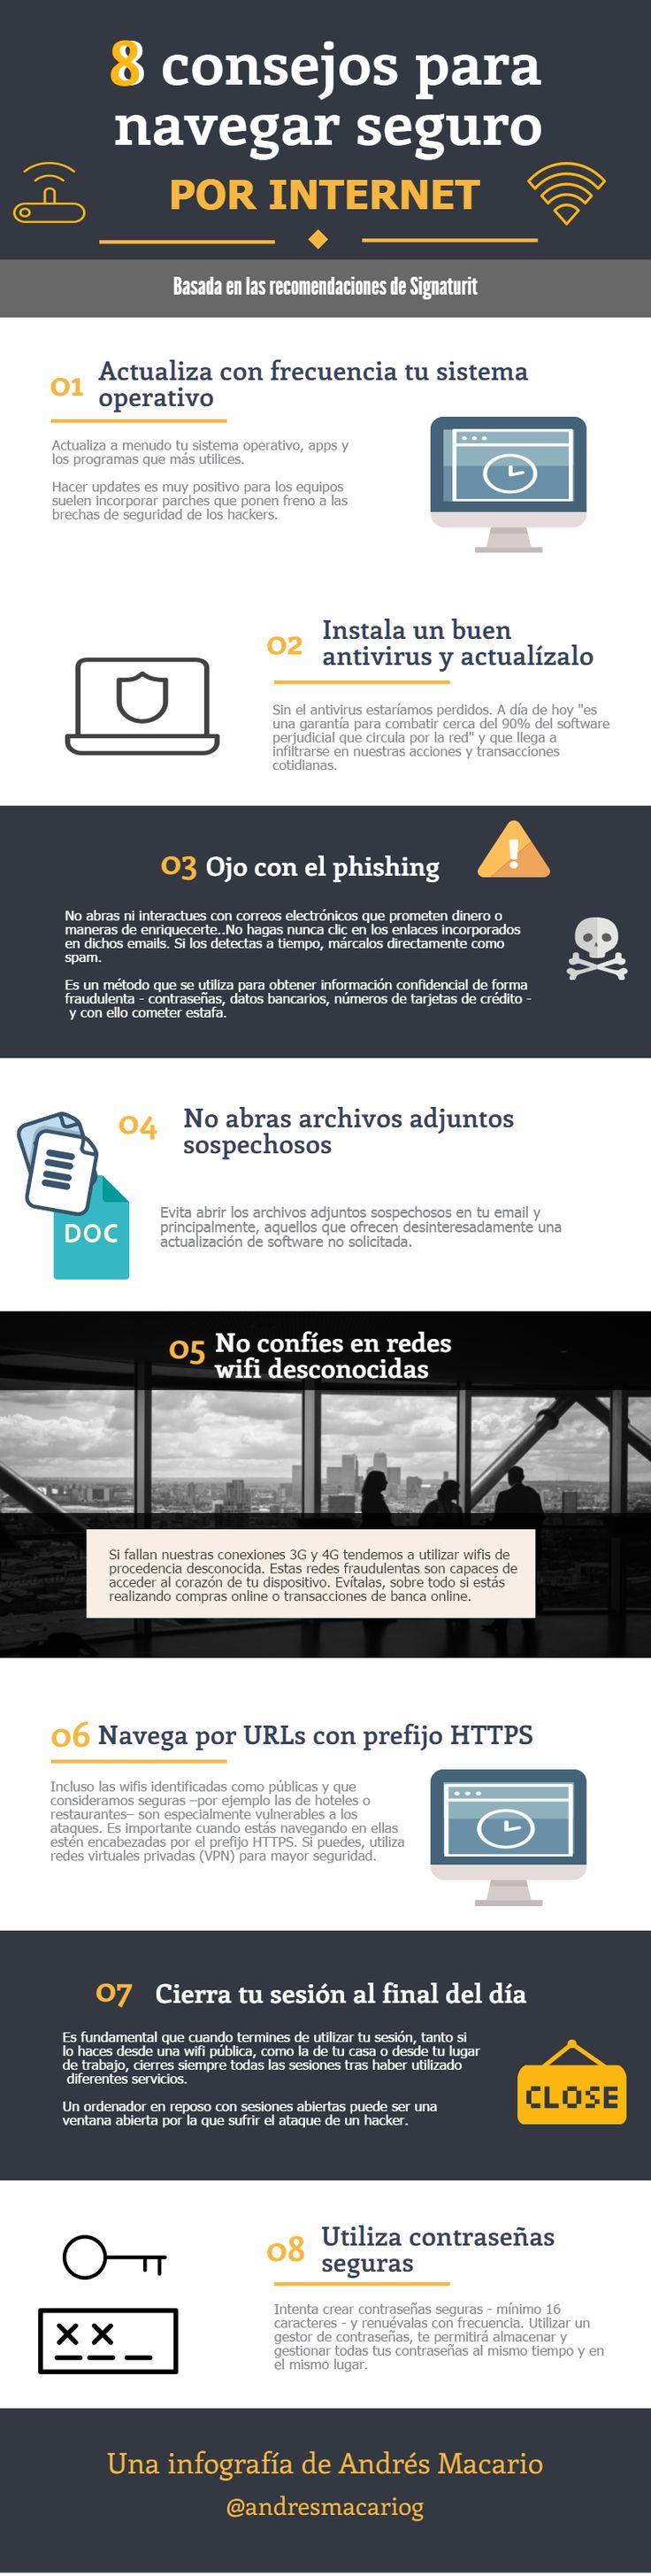 8 consejos para navegar seguro por Internet #infografia